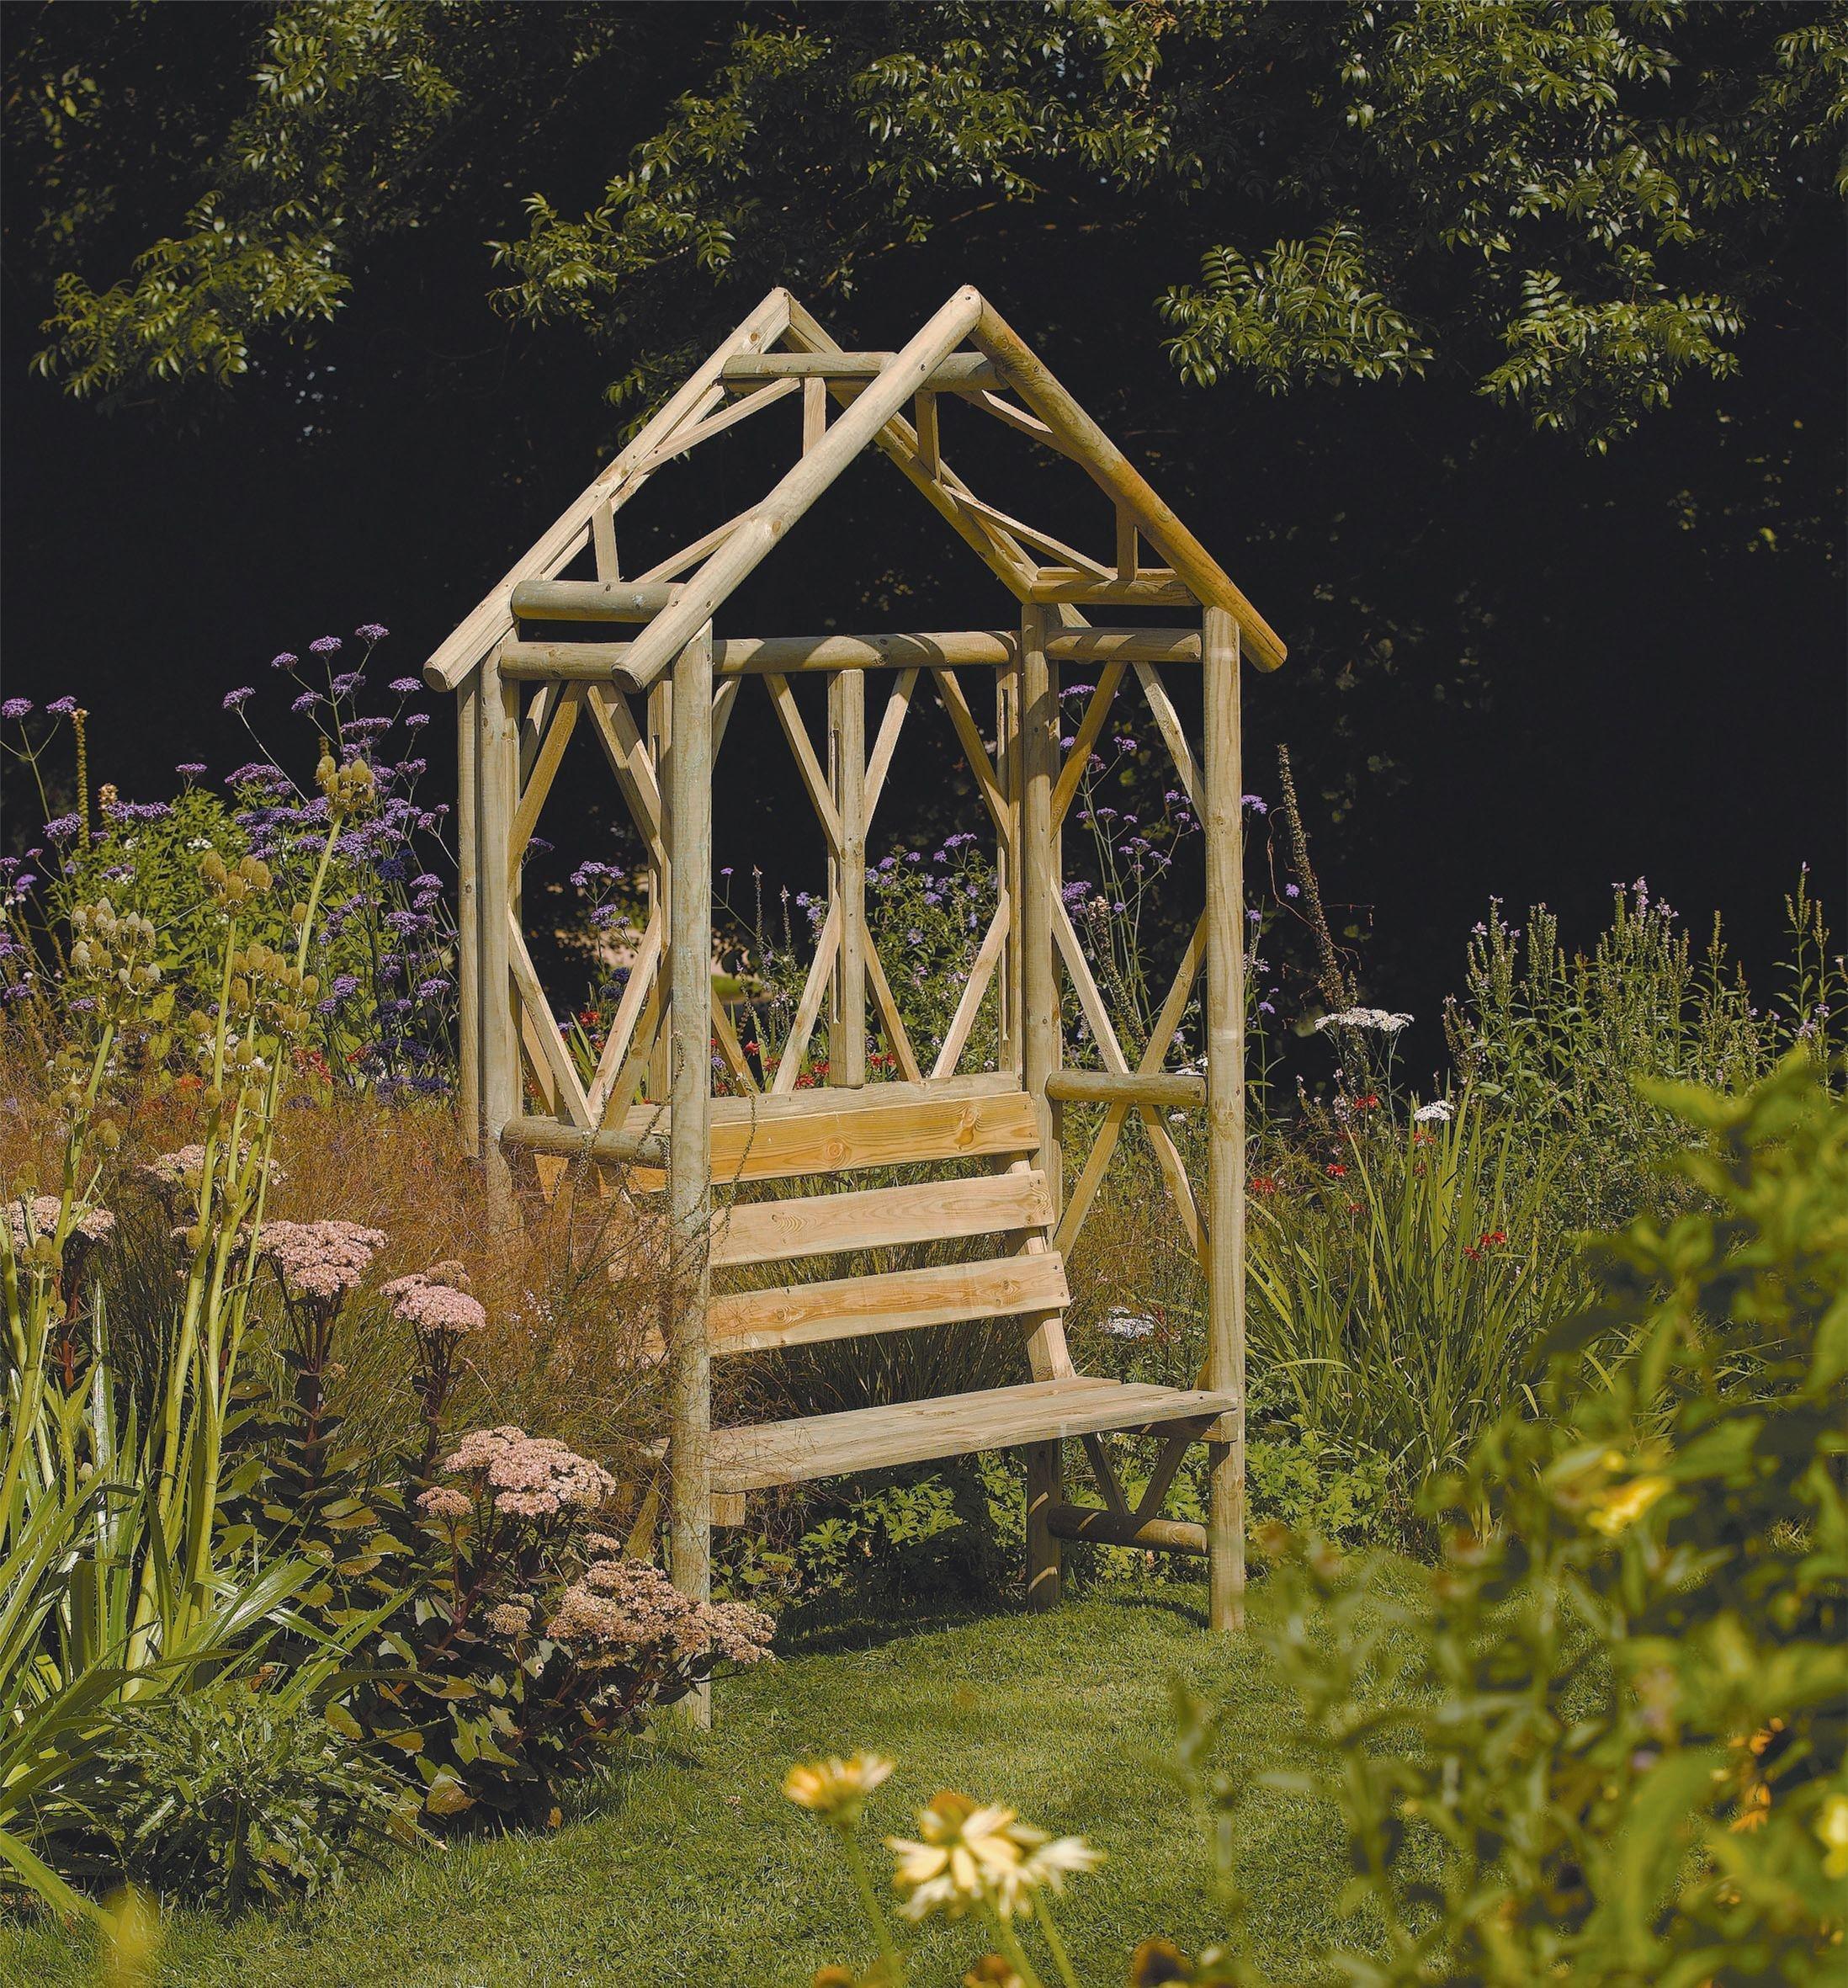 Rowlinson Garden Rustic Bench. lowest price